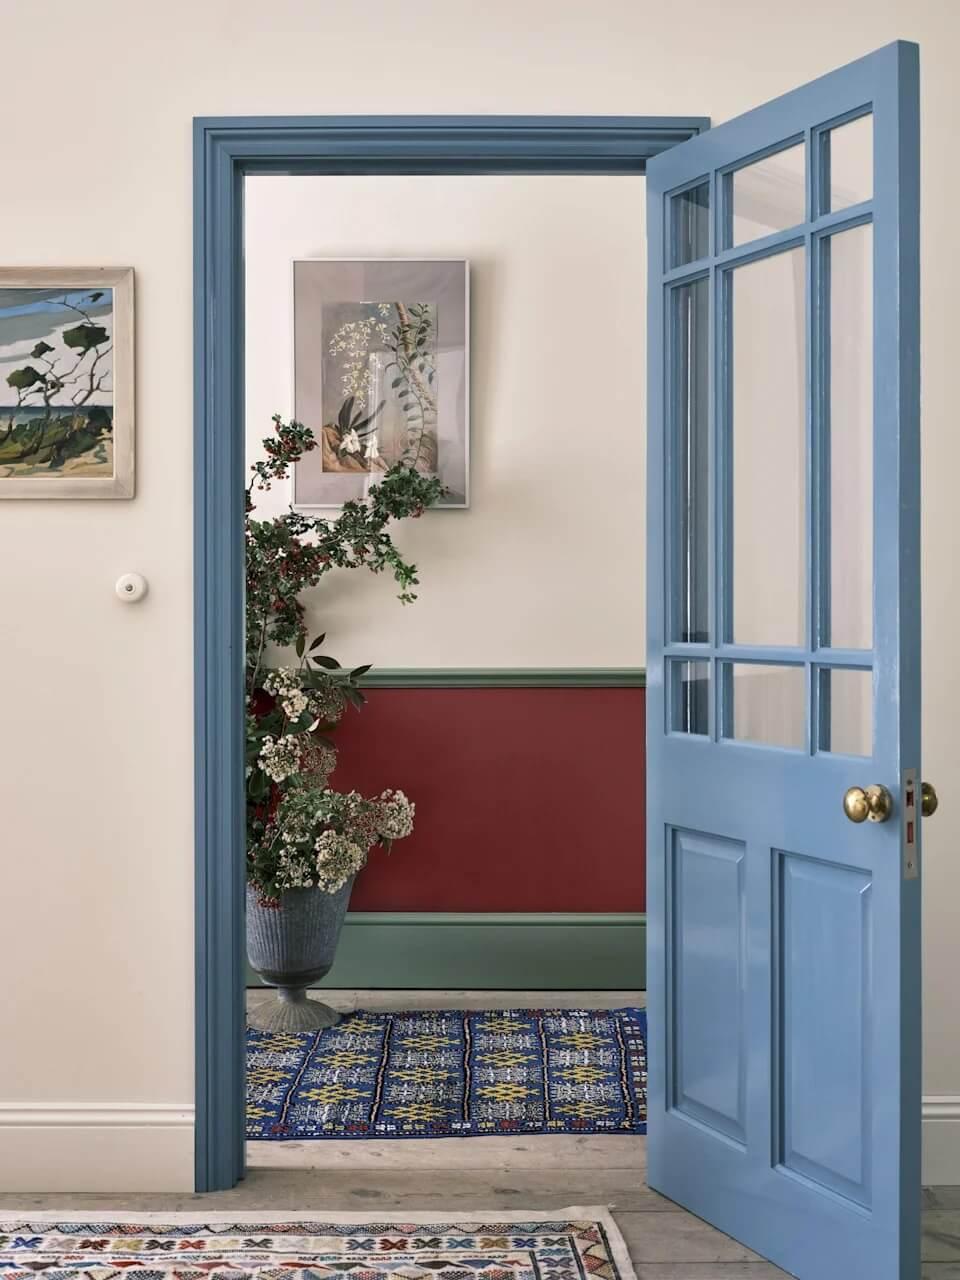 stone-blue-farrow-ball-colour-trends-2022-nordroom